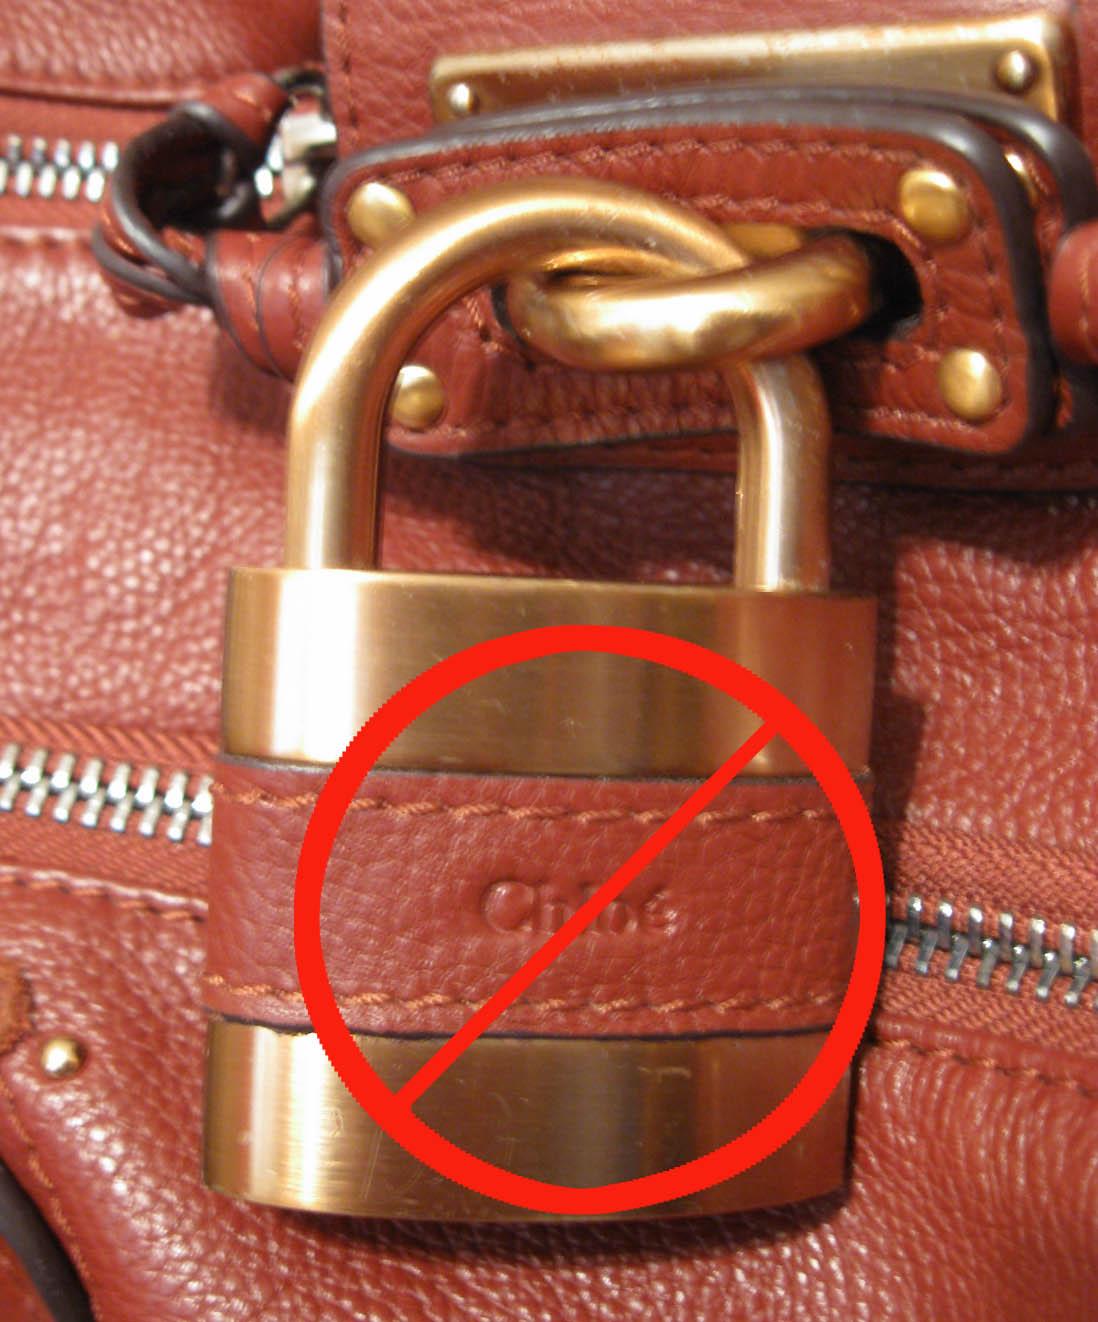 chloe purses prices - madam0wl: Duped